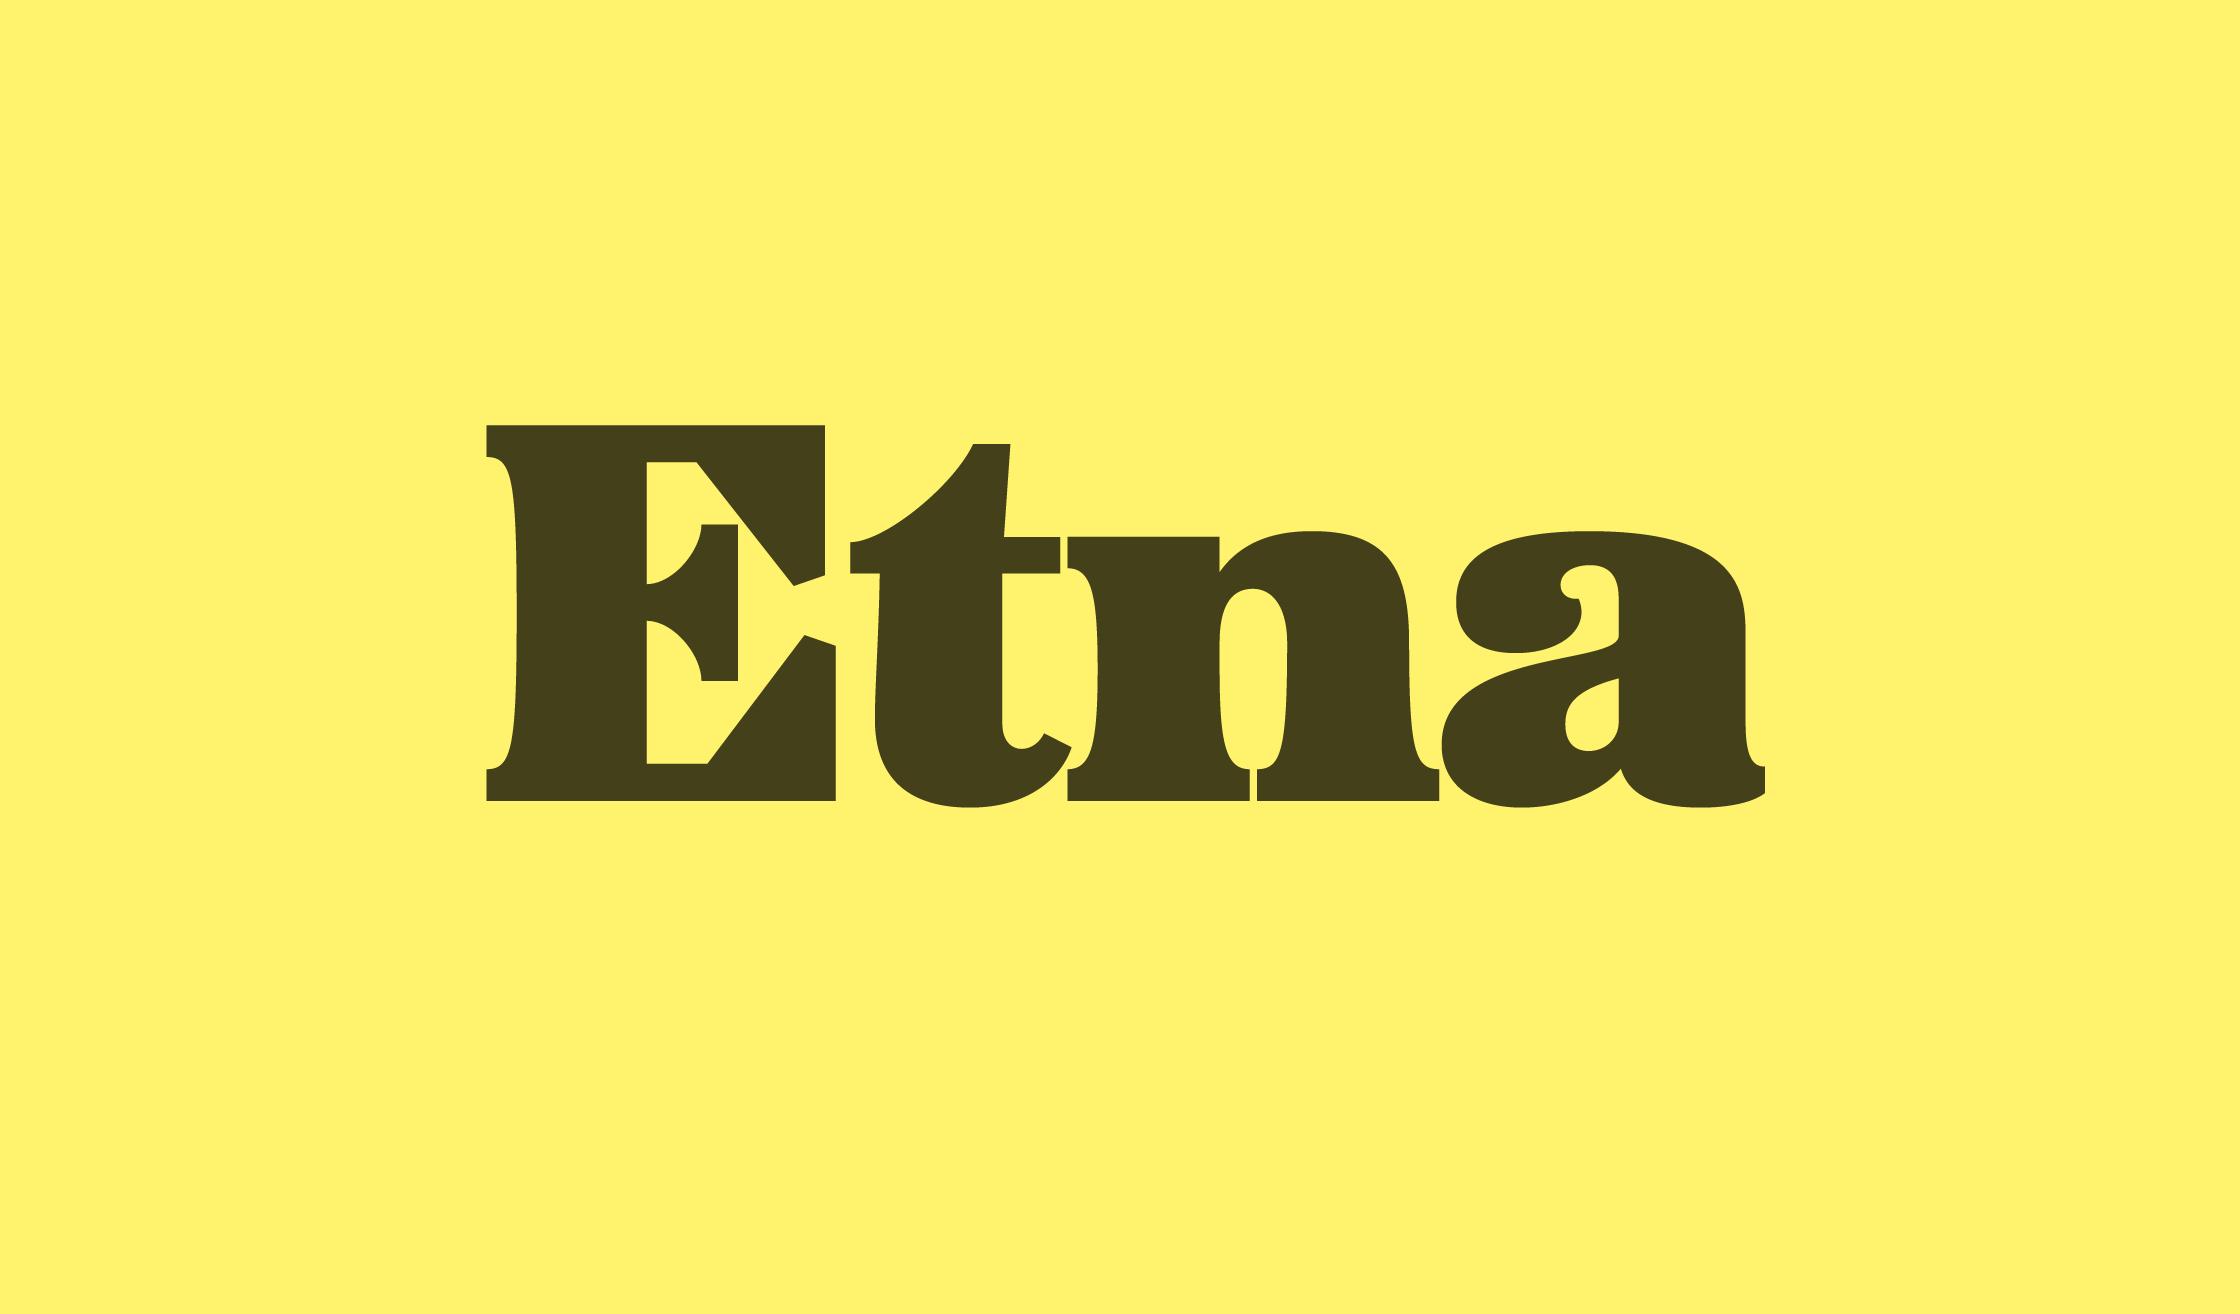 Etna Banner Name 2240